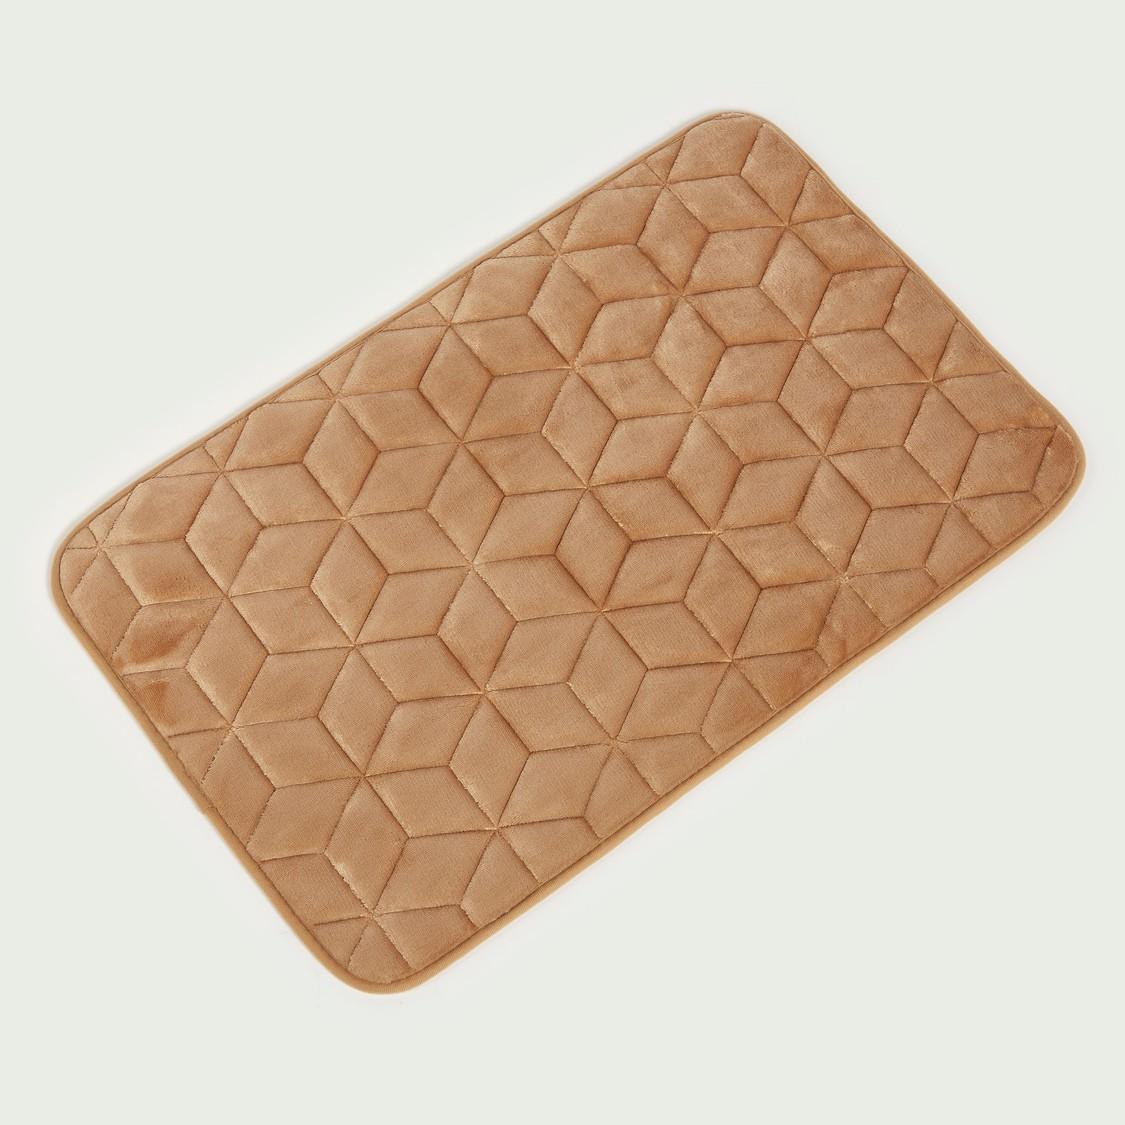 Textured Bath Mat and Contour U Shaped Mat Set - 45x70 cms and 45x45 cms